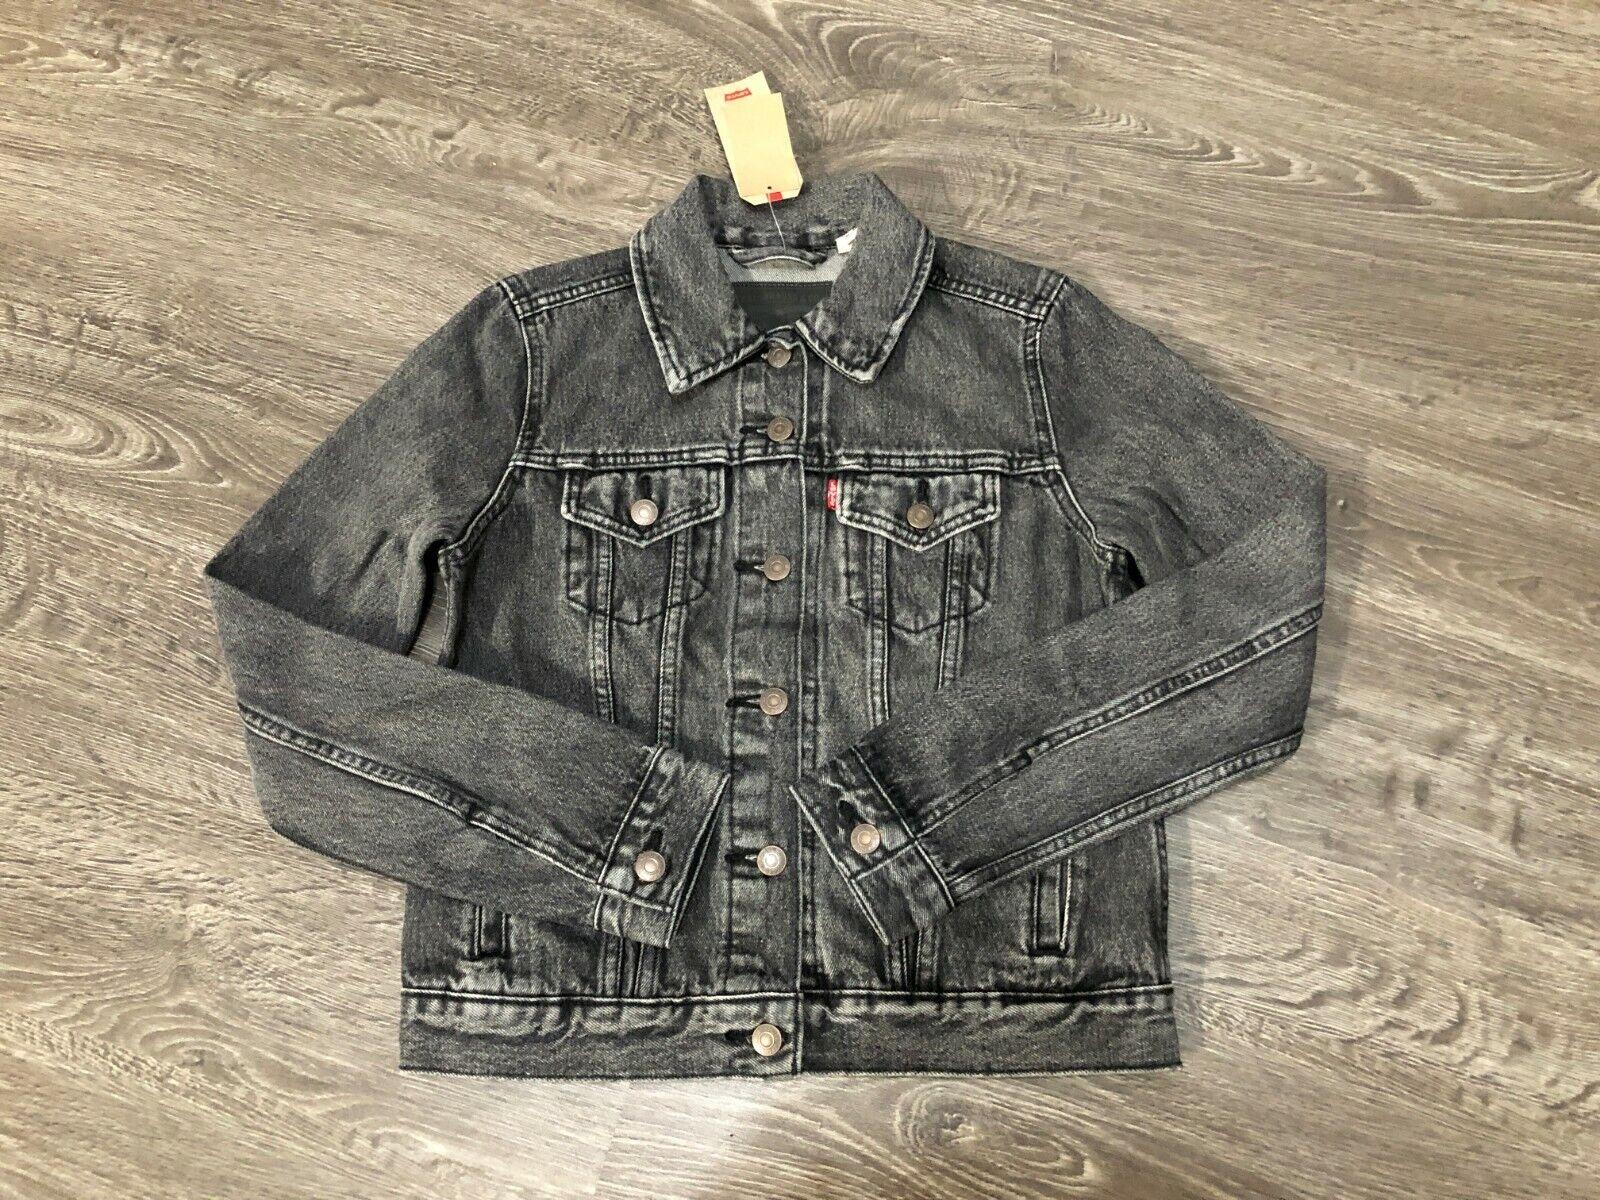 Women's Levi's Original Trucker Jacket Black Charcoal Gray D